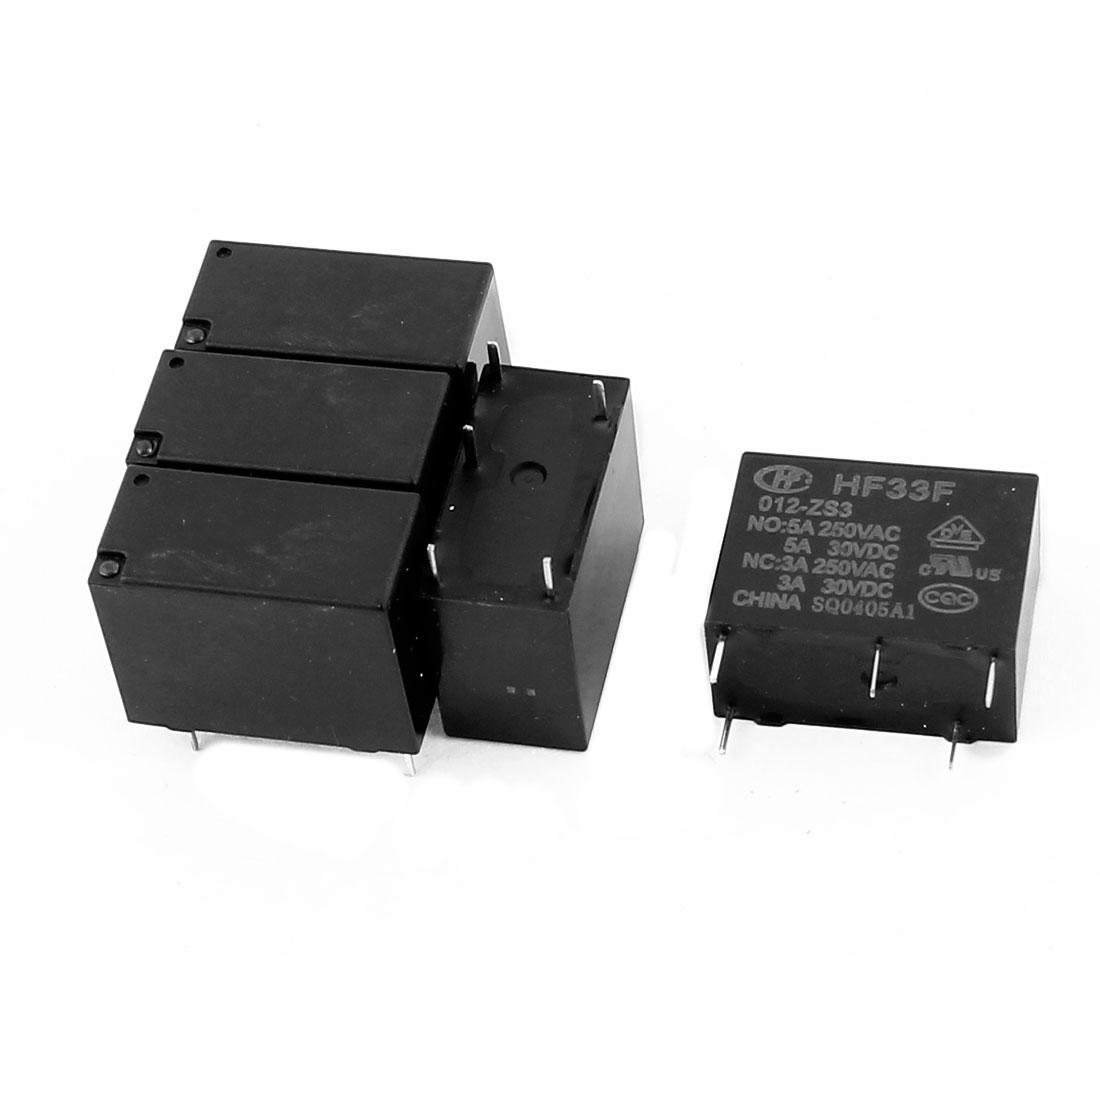 5 Pcs 30VDC 250VAC 5A 5 Terminal Conversion SPDT HF33F-012-ZS3 Power Relay